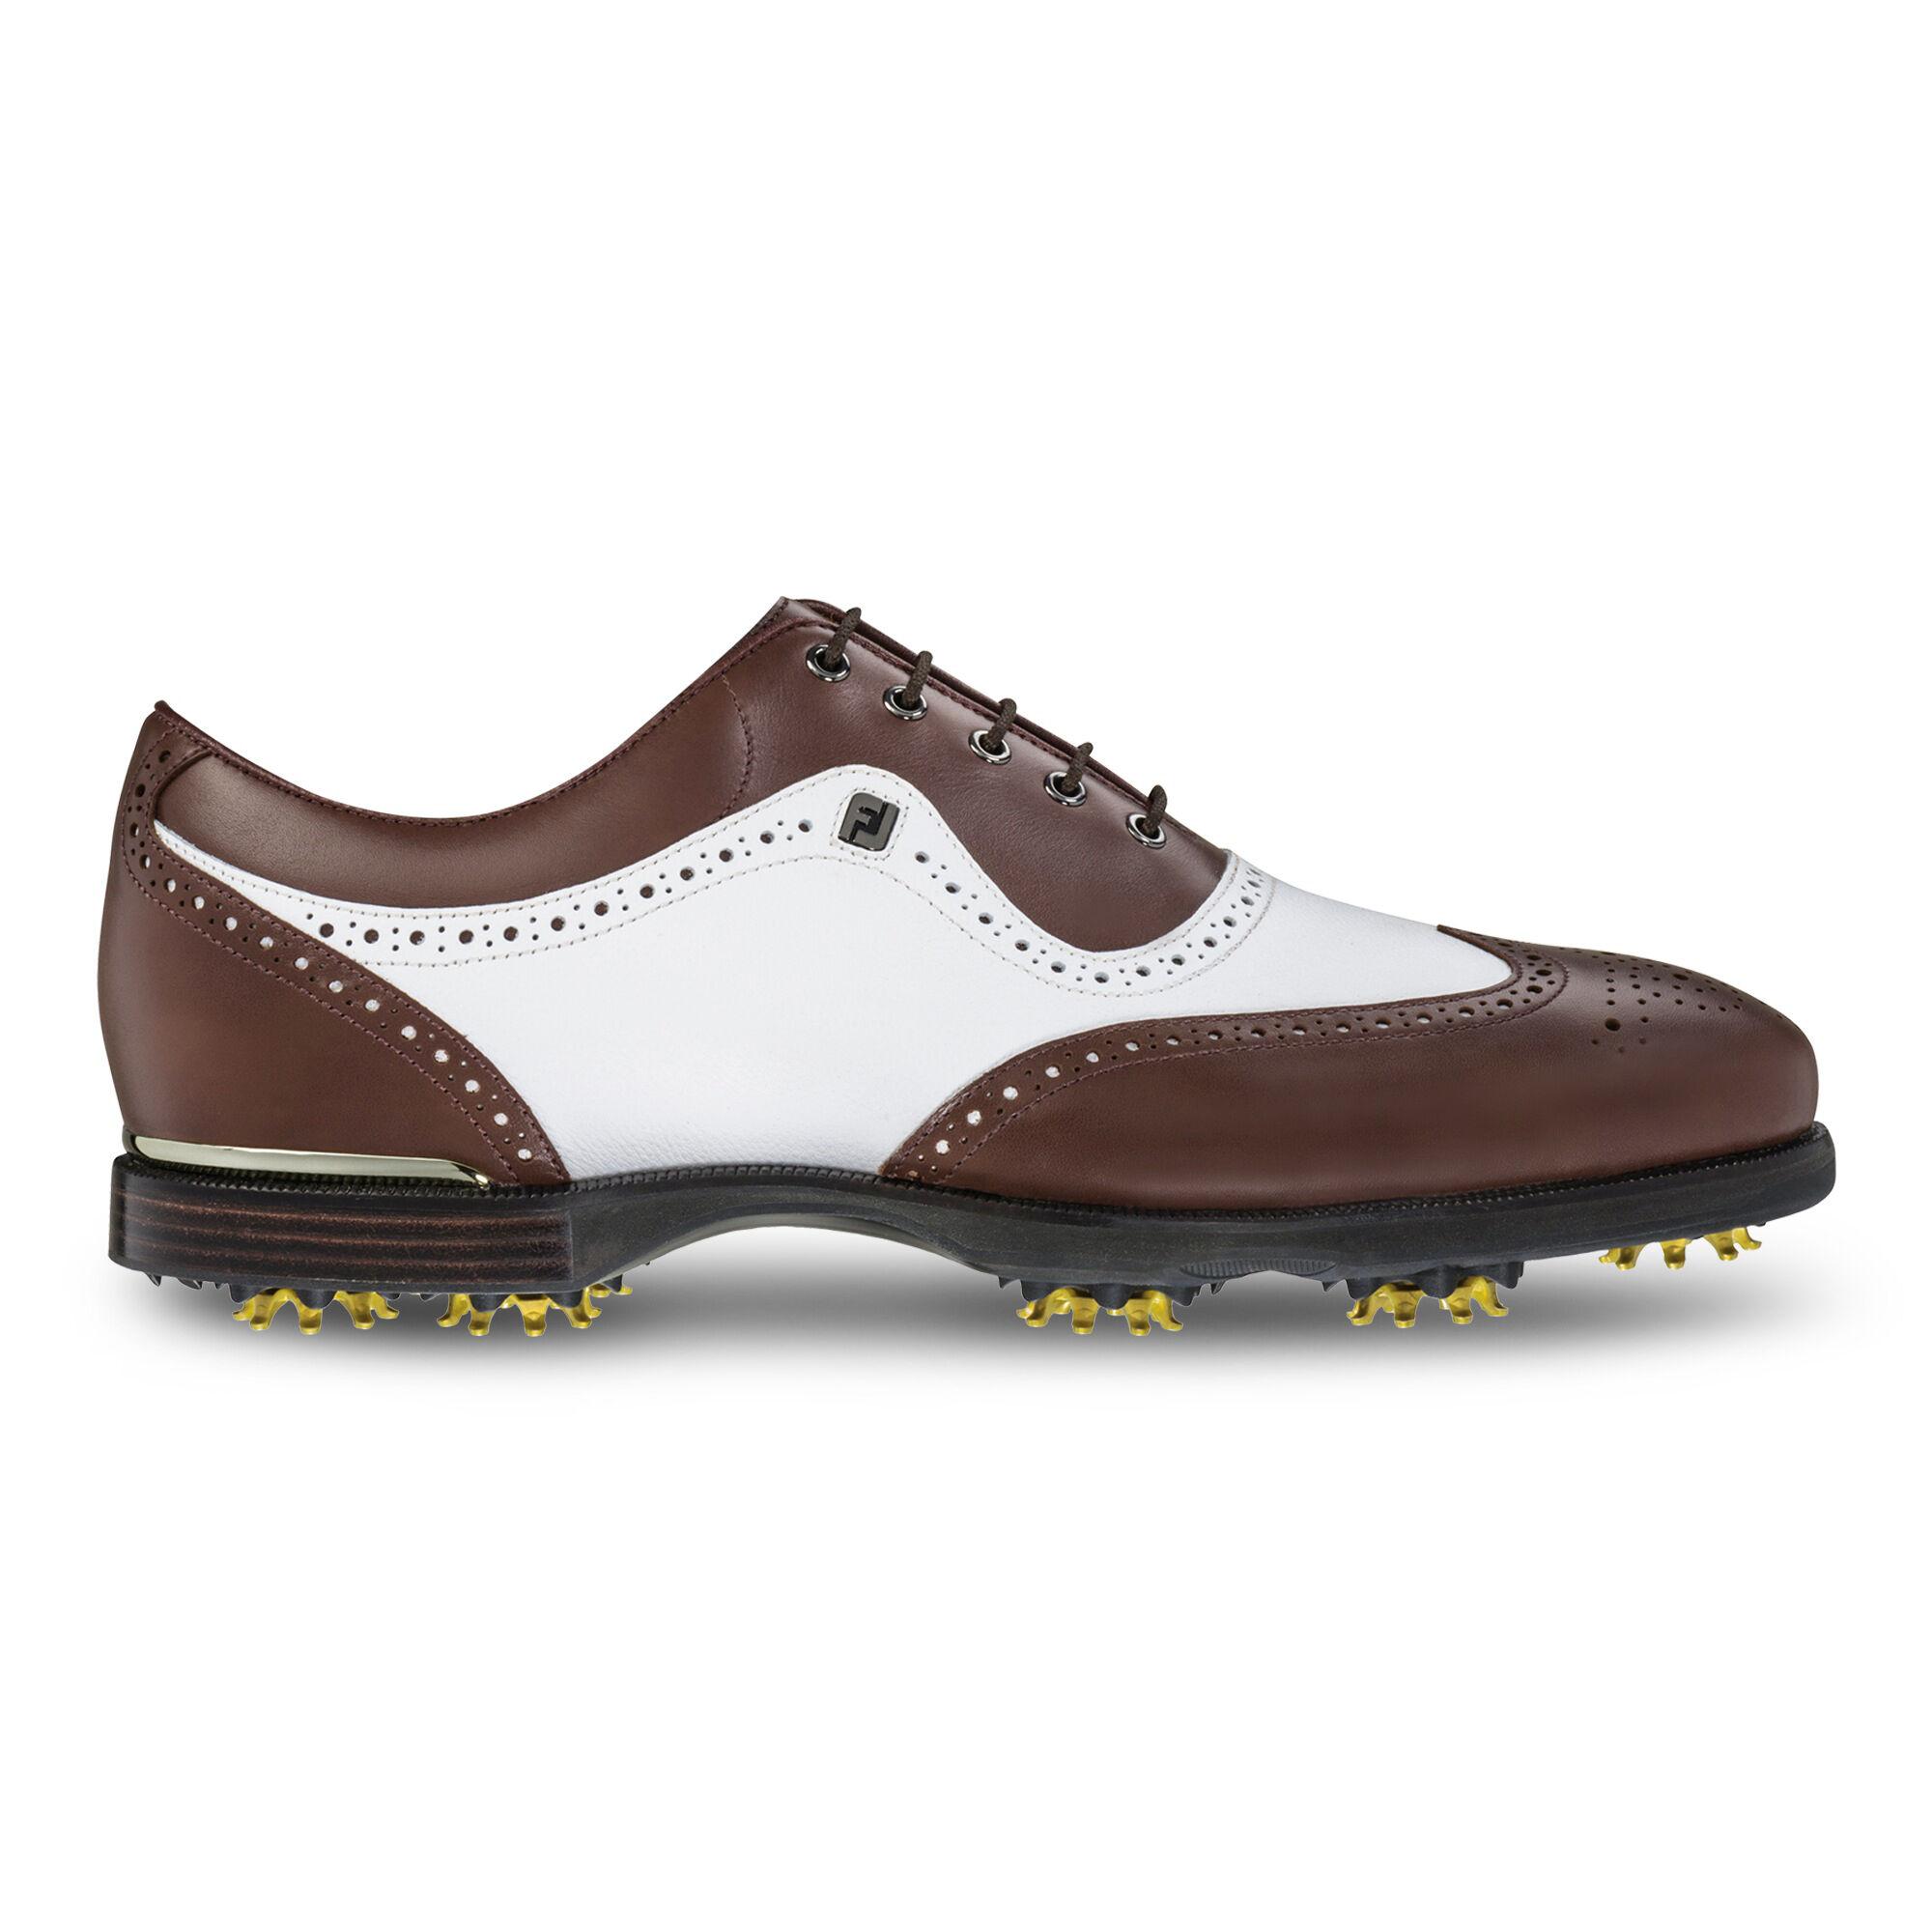 golf shies